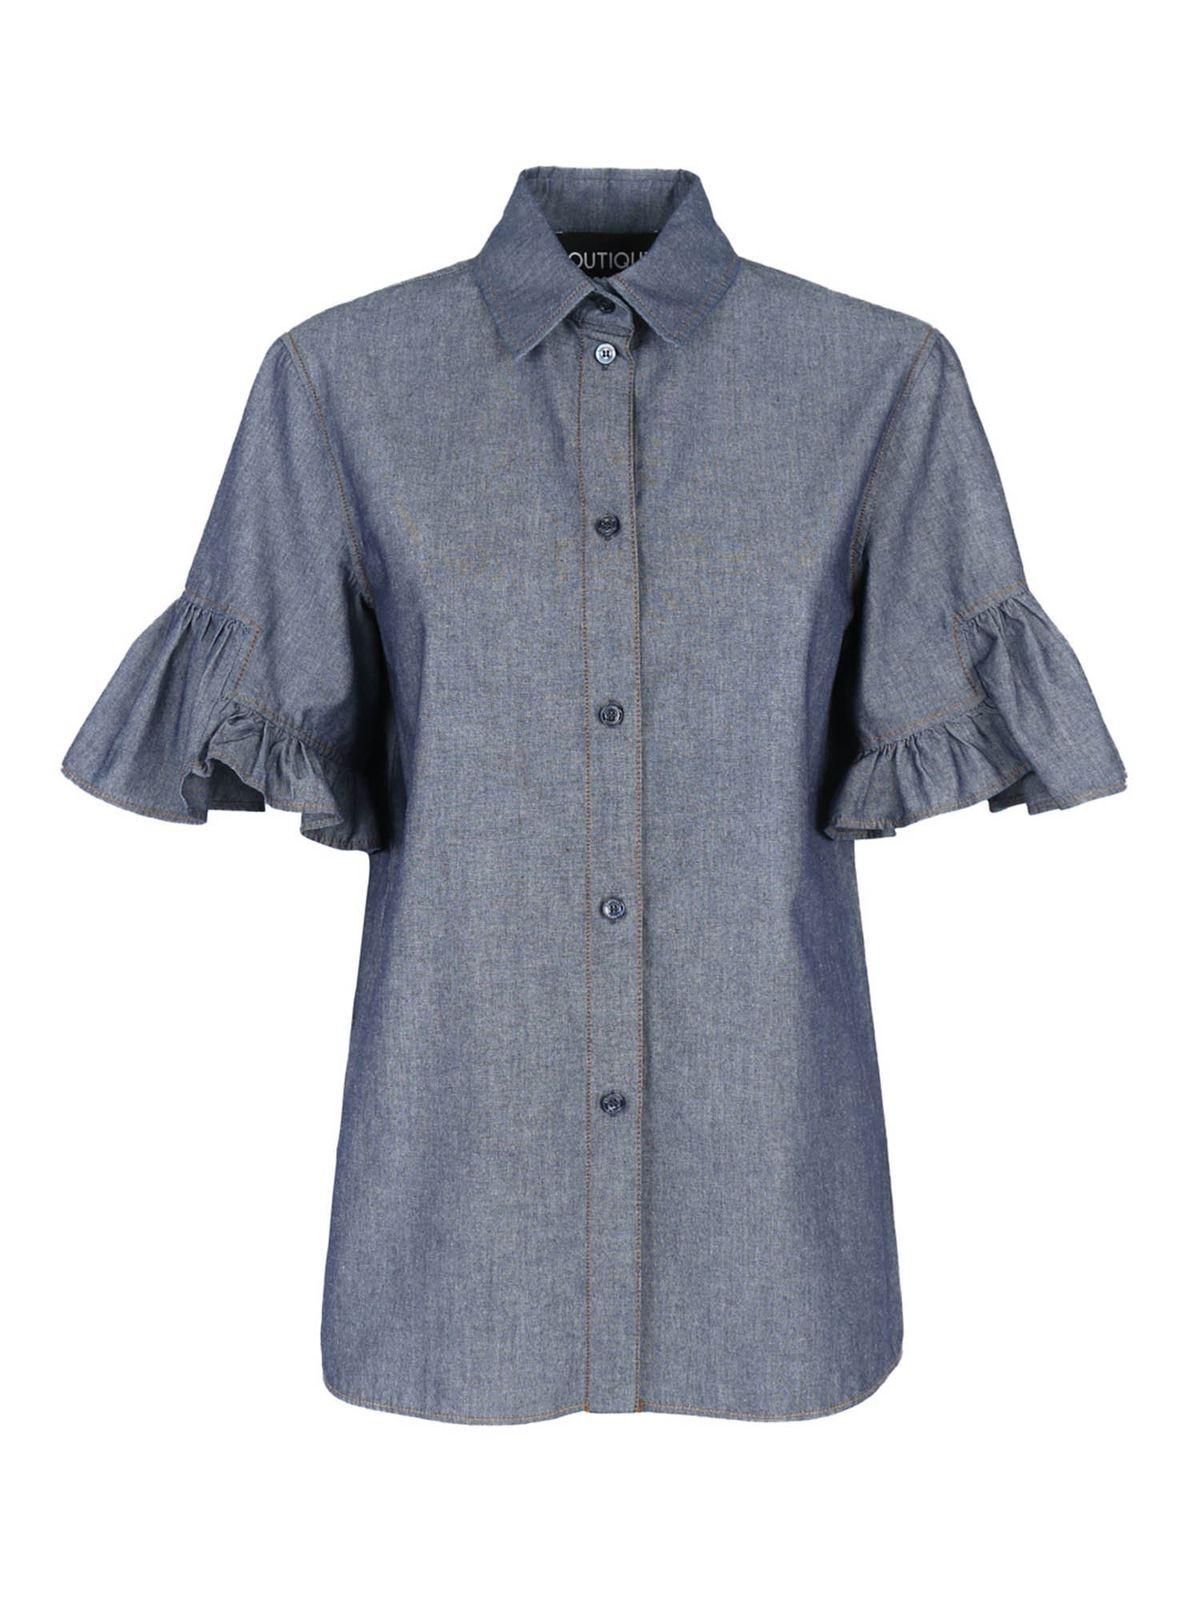 Moschino Boutique Shirts RUFFLE JEANS SHIRT IN BLUE